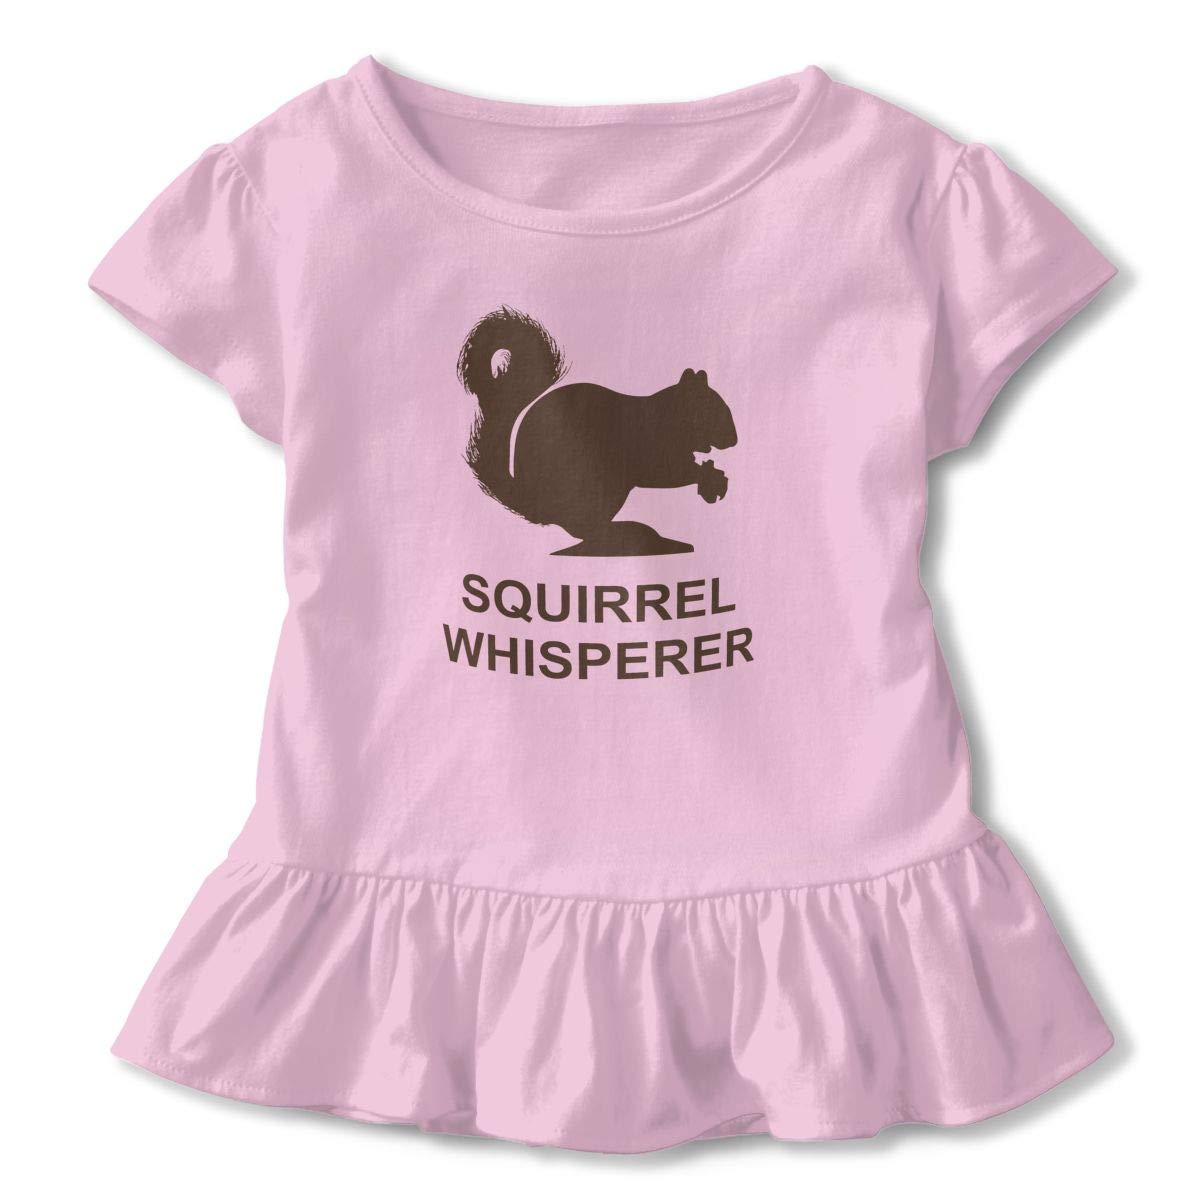 ZP-CCYF Squirrel Whisperer Toddler Baby Girl Ruffle Short Sleeve T-Shirt Comfortable Cotton T Shirts